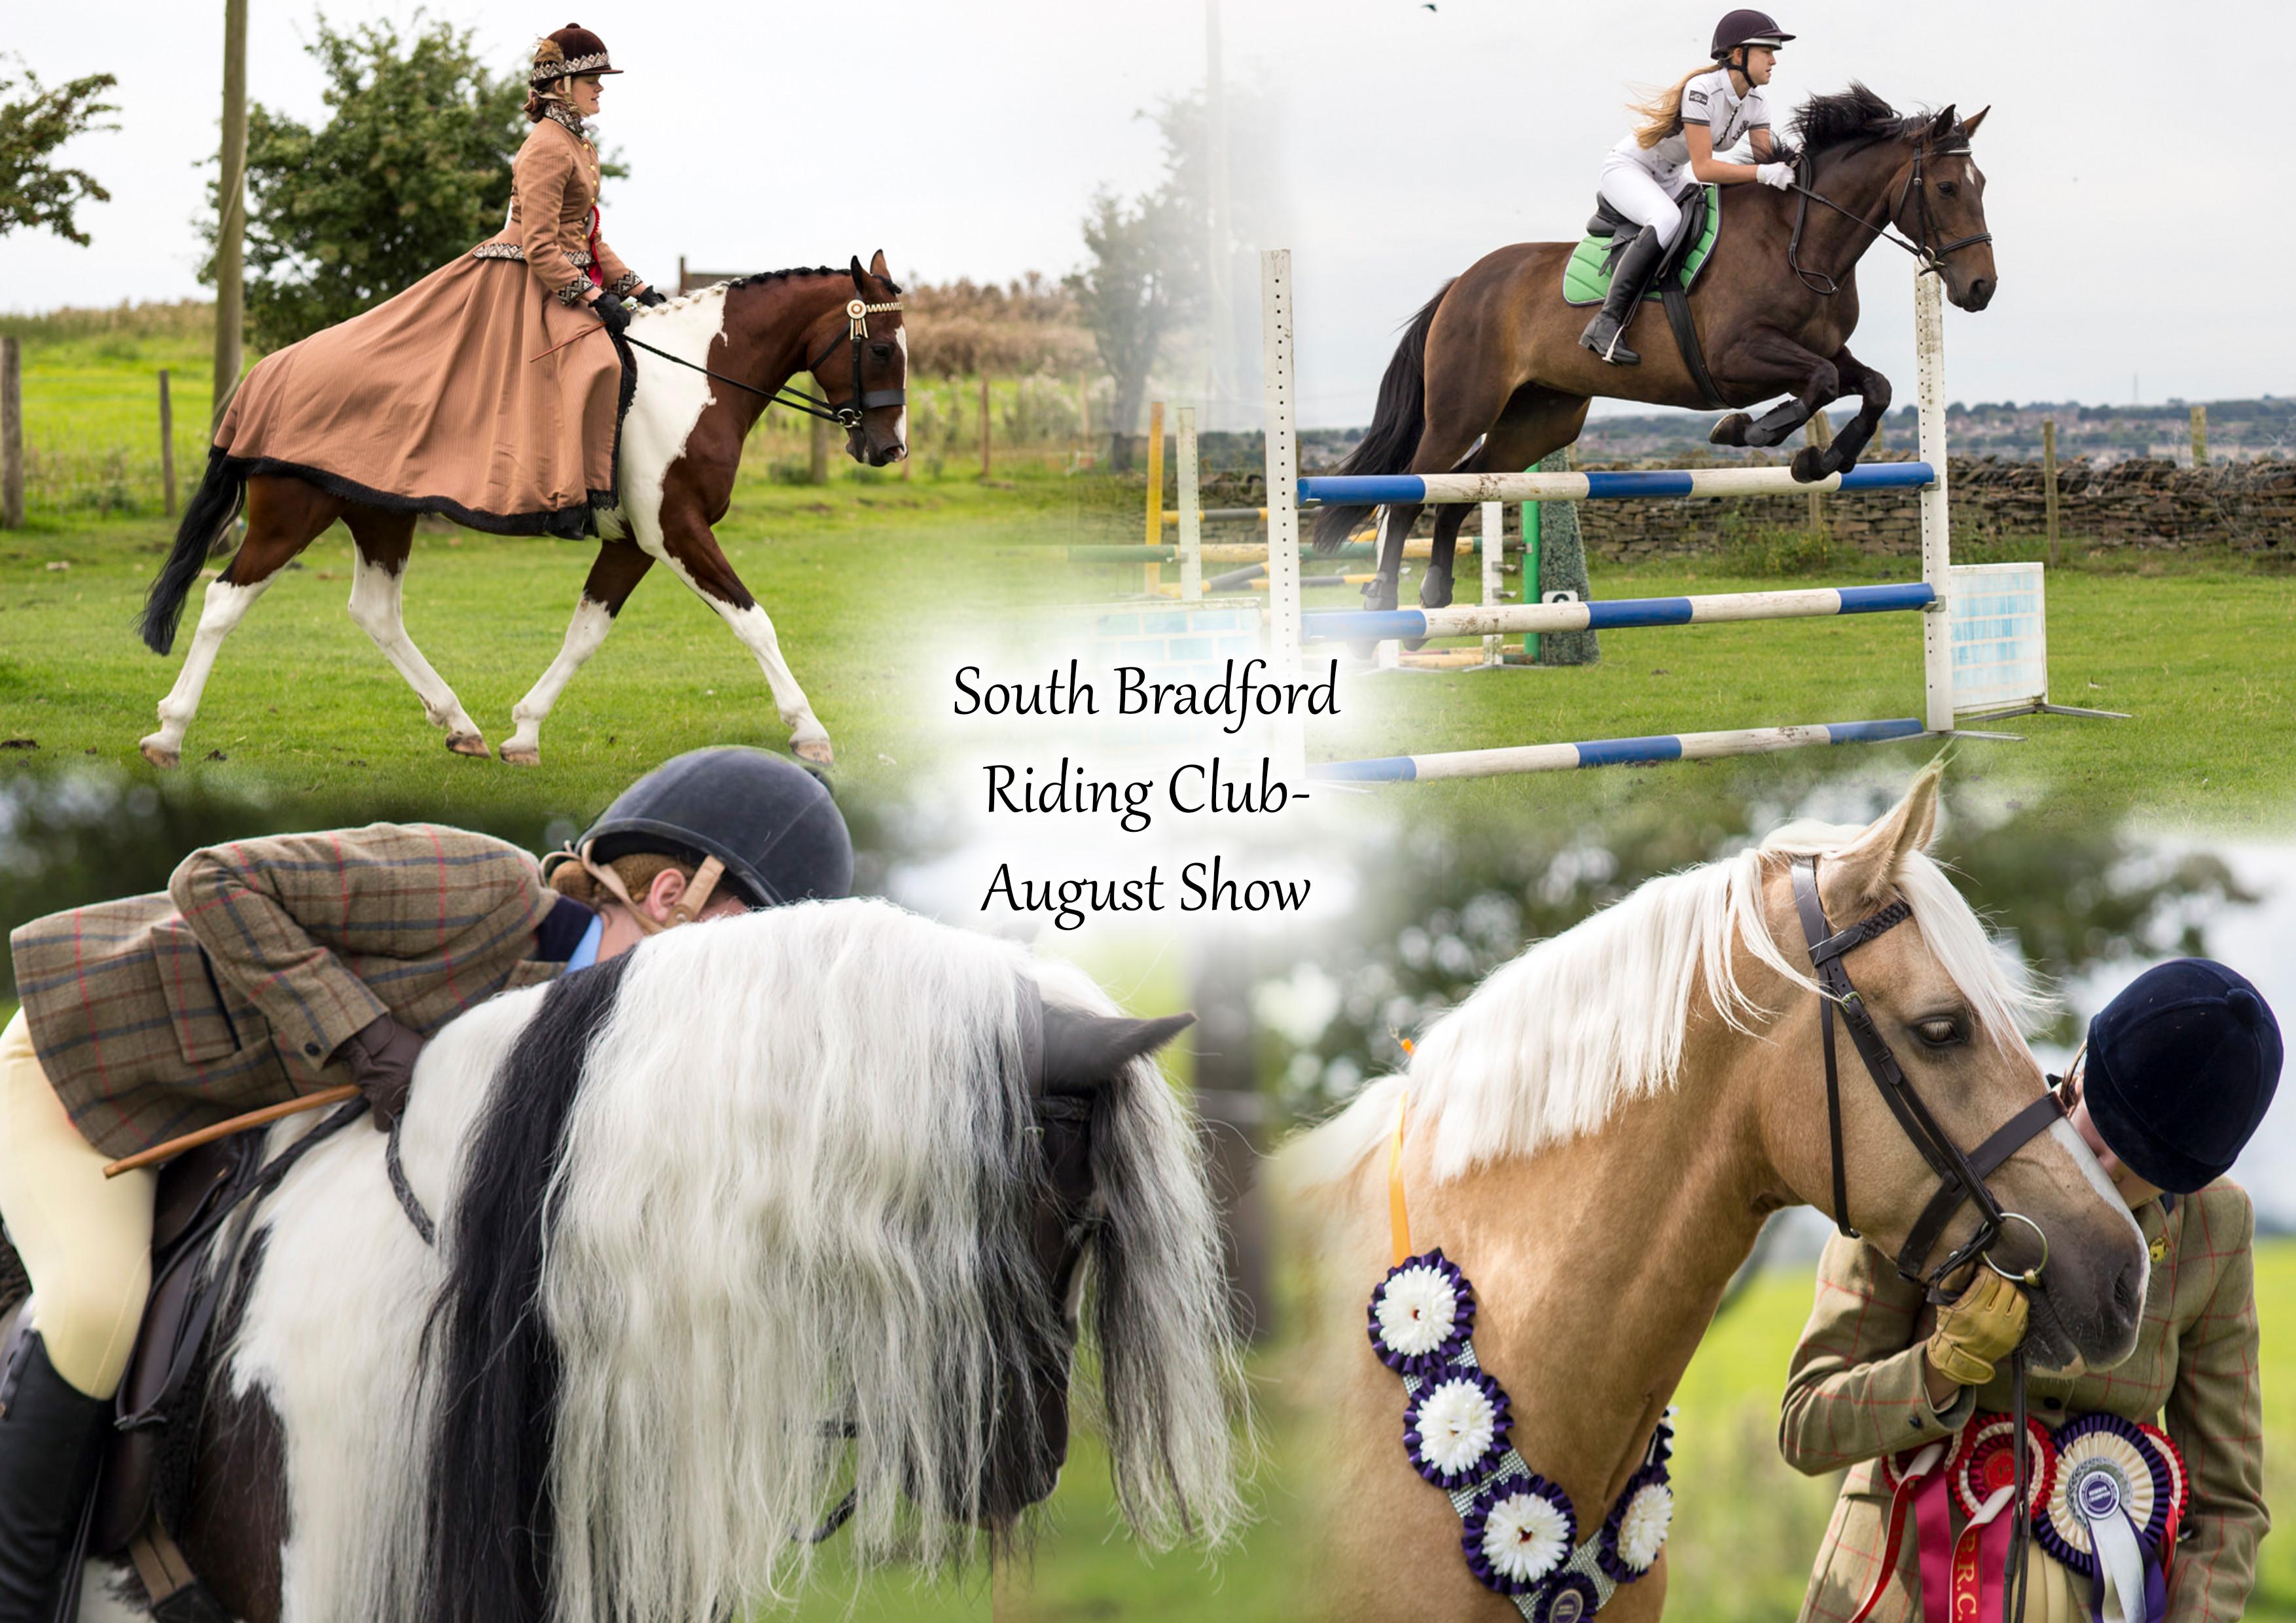 South Bradford Riding Club- August Show